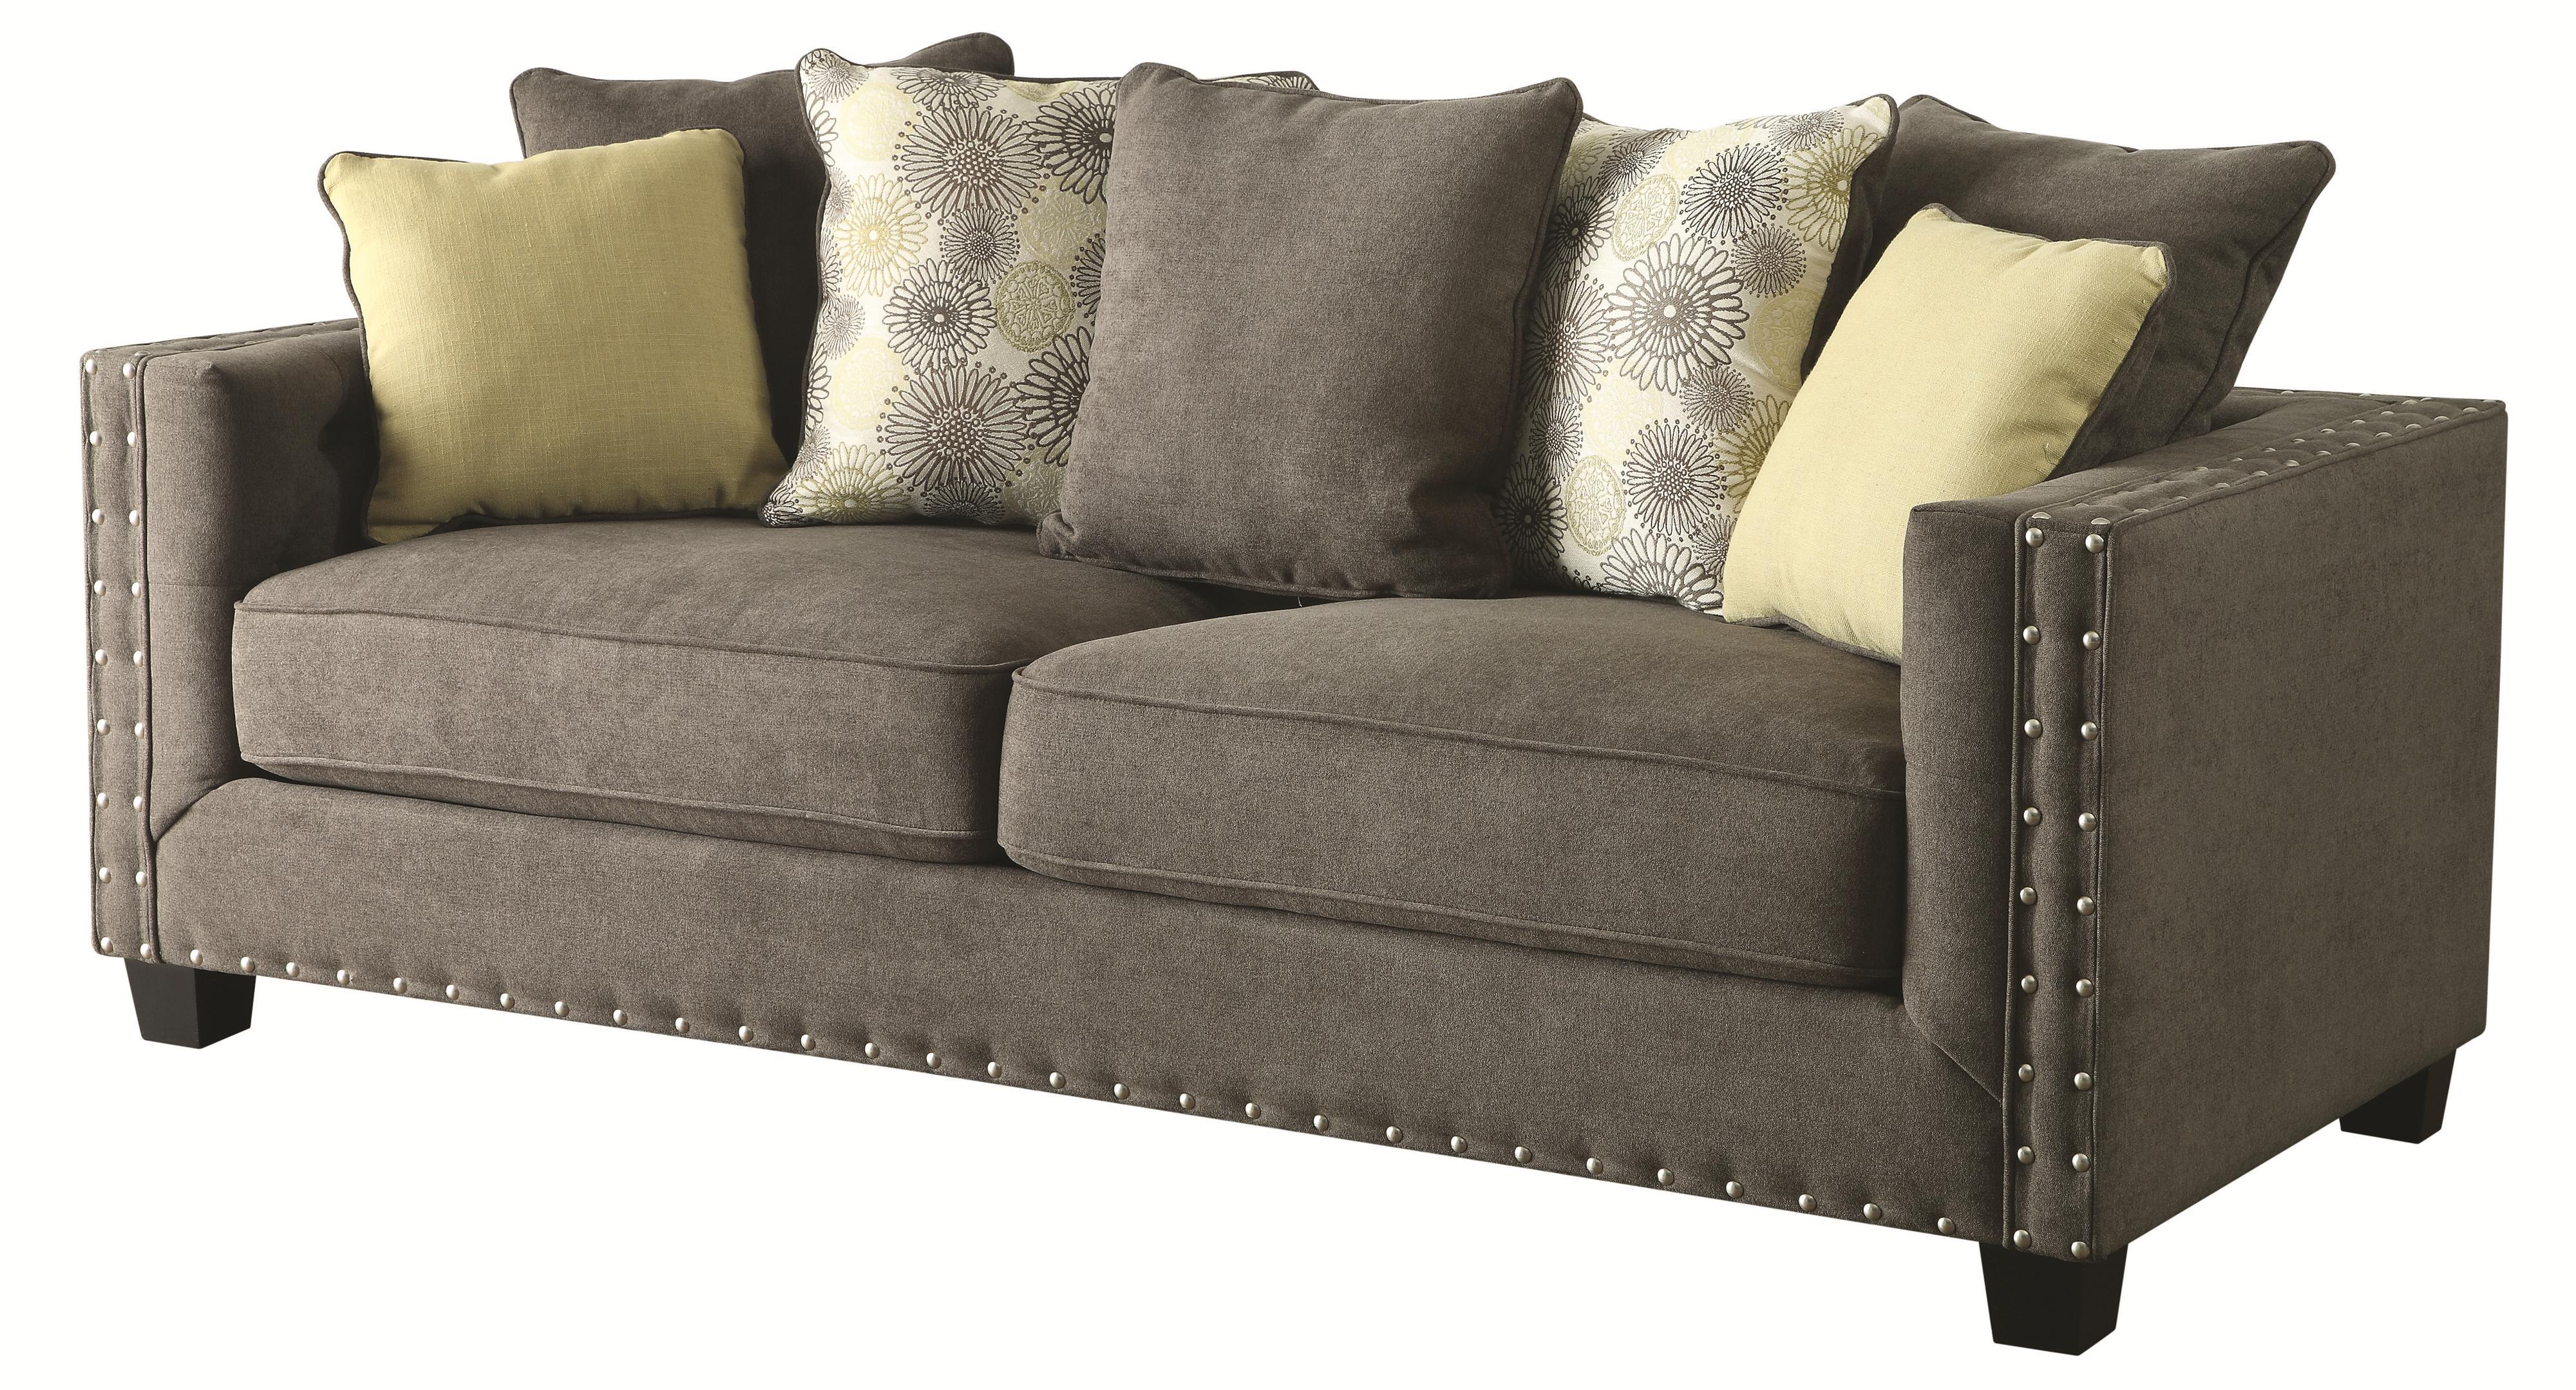 Coaster Kelvington Tuxedo Sofa - Item Number: 501421-Kelvington Charcoal